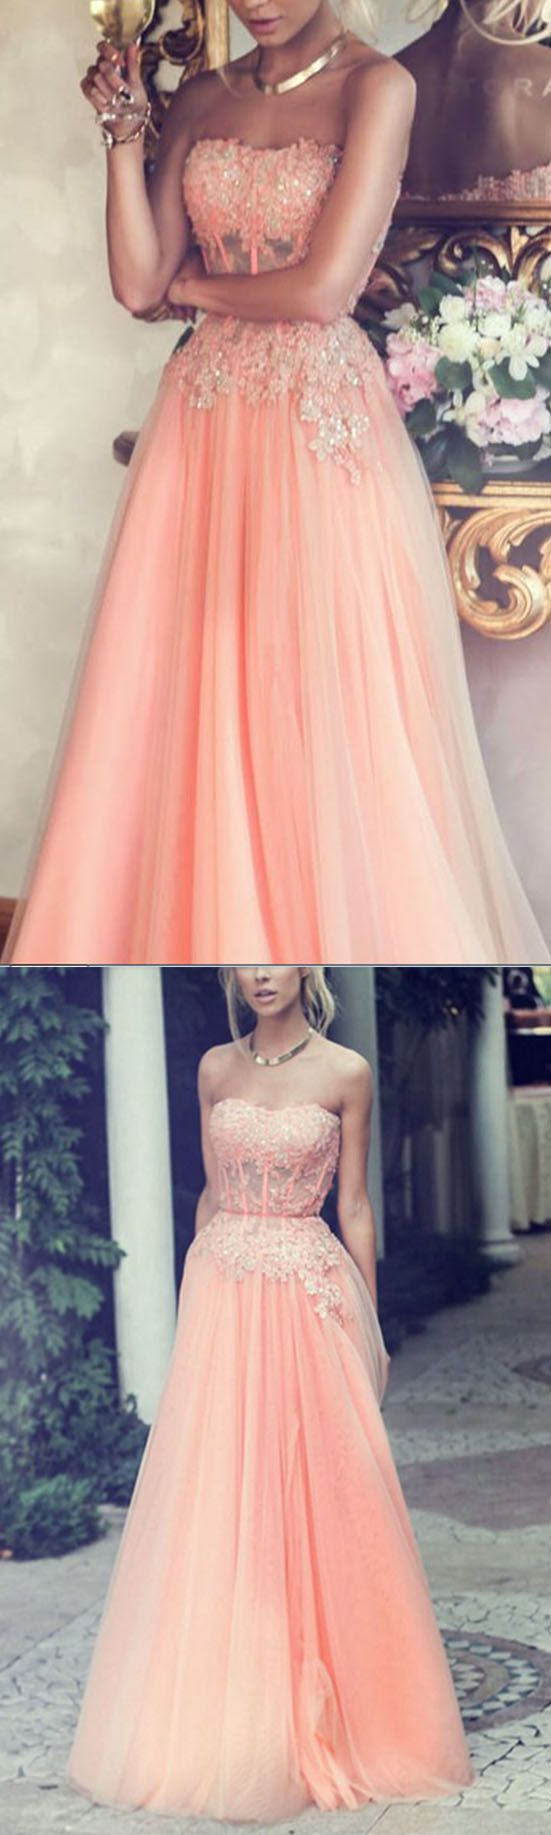 Charming Prom Dresses, Strapless Pom Dress, Pink Prom Dresses, Long Evening Dresses, Women Party Dresses